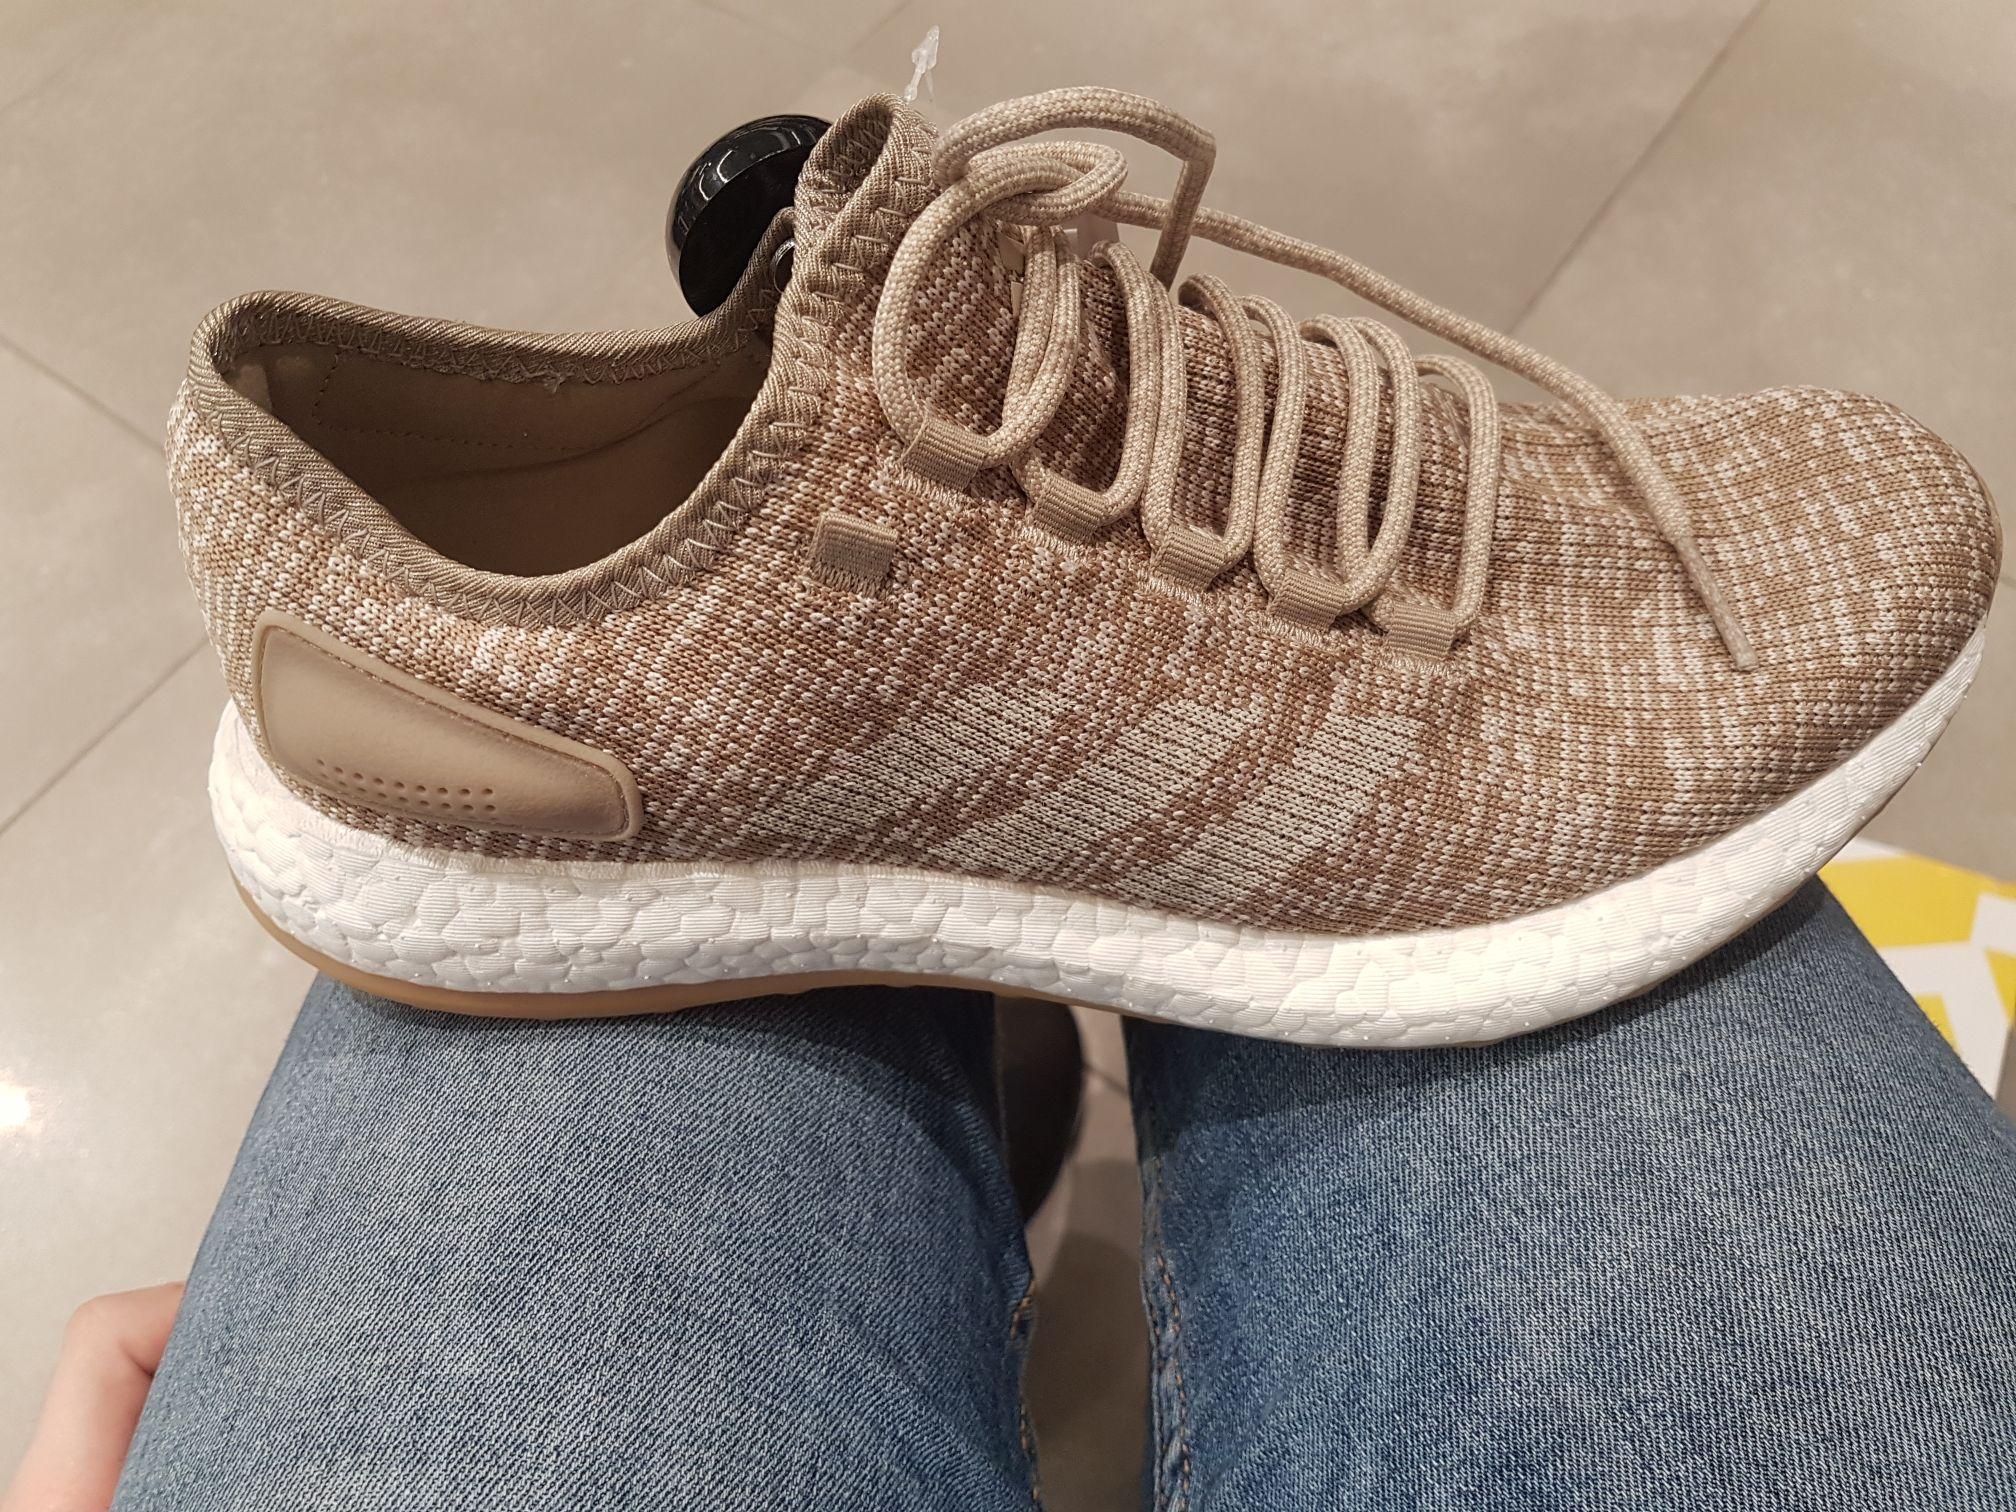 Adidas Pureboost Factory outlet KRK